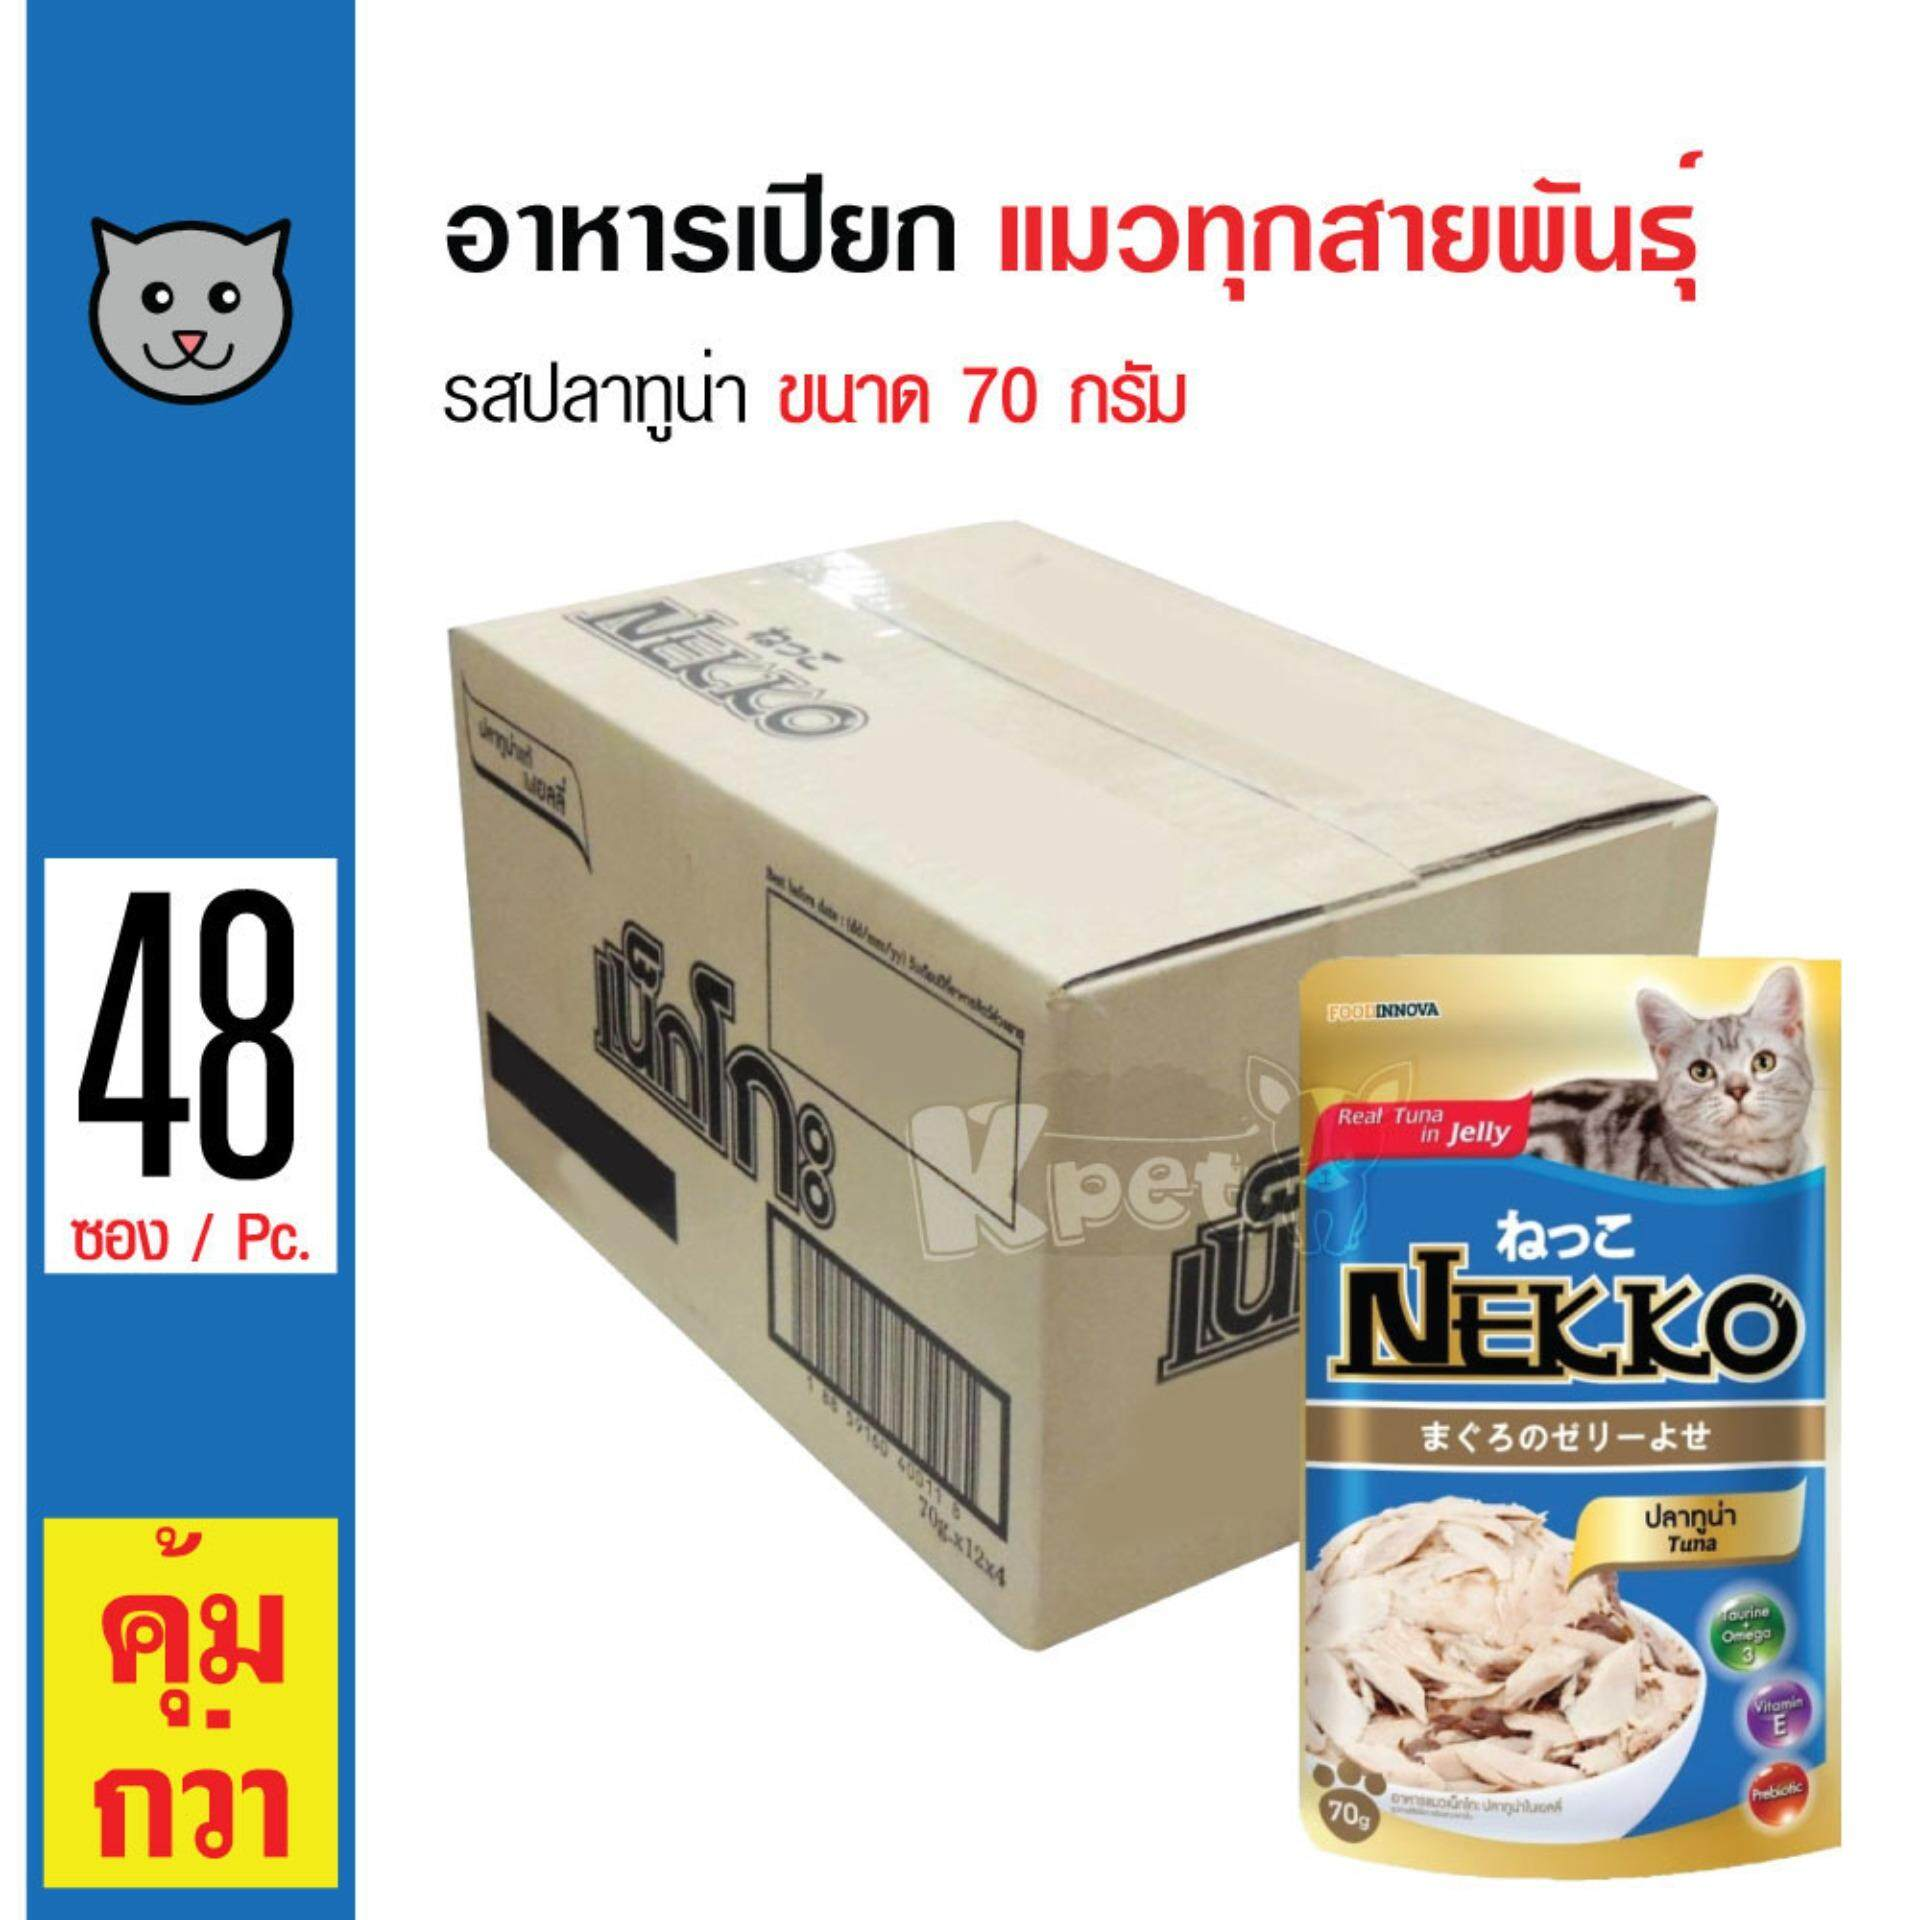 Nekko Tuna Pouch อาหารเปียกแมว อาหารแมว สูตรปลาทูน่า บำรุงขน สำหรับแมวทุกสายพันธุ์ (70กรัม/ซอง) X 48 ซอง By Kpet.